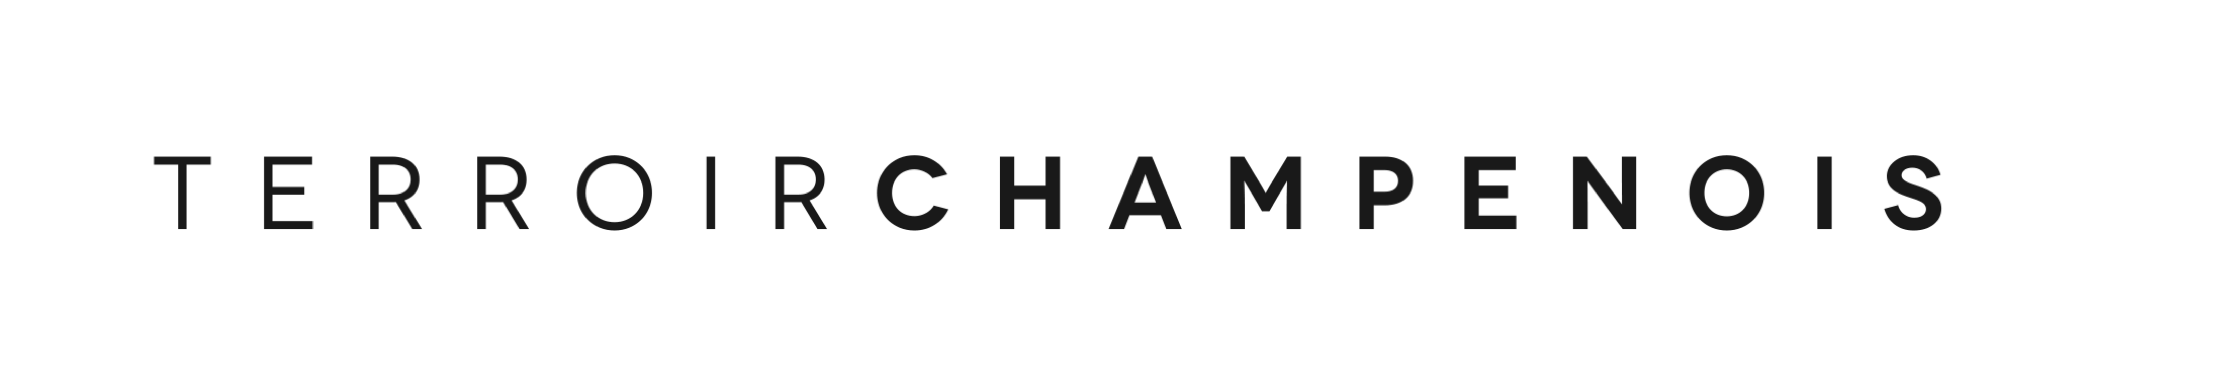 Terroir Champenois Logo para Móvil